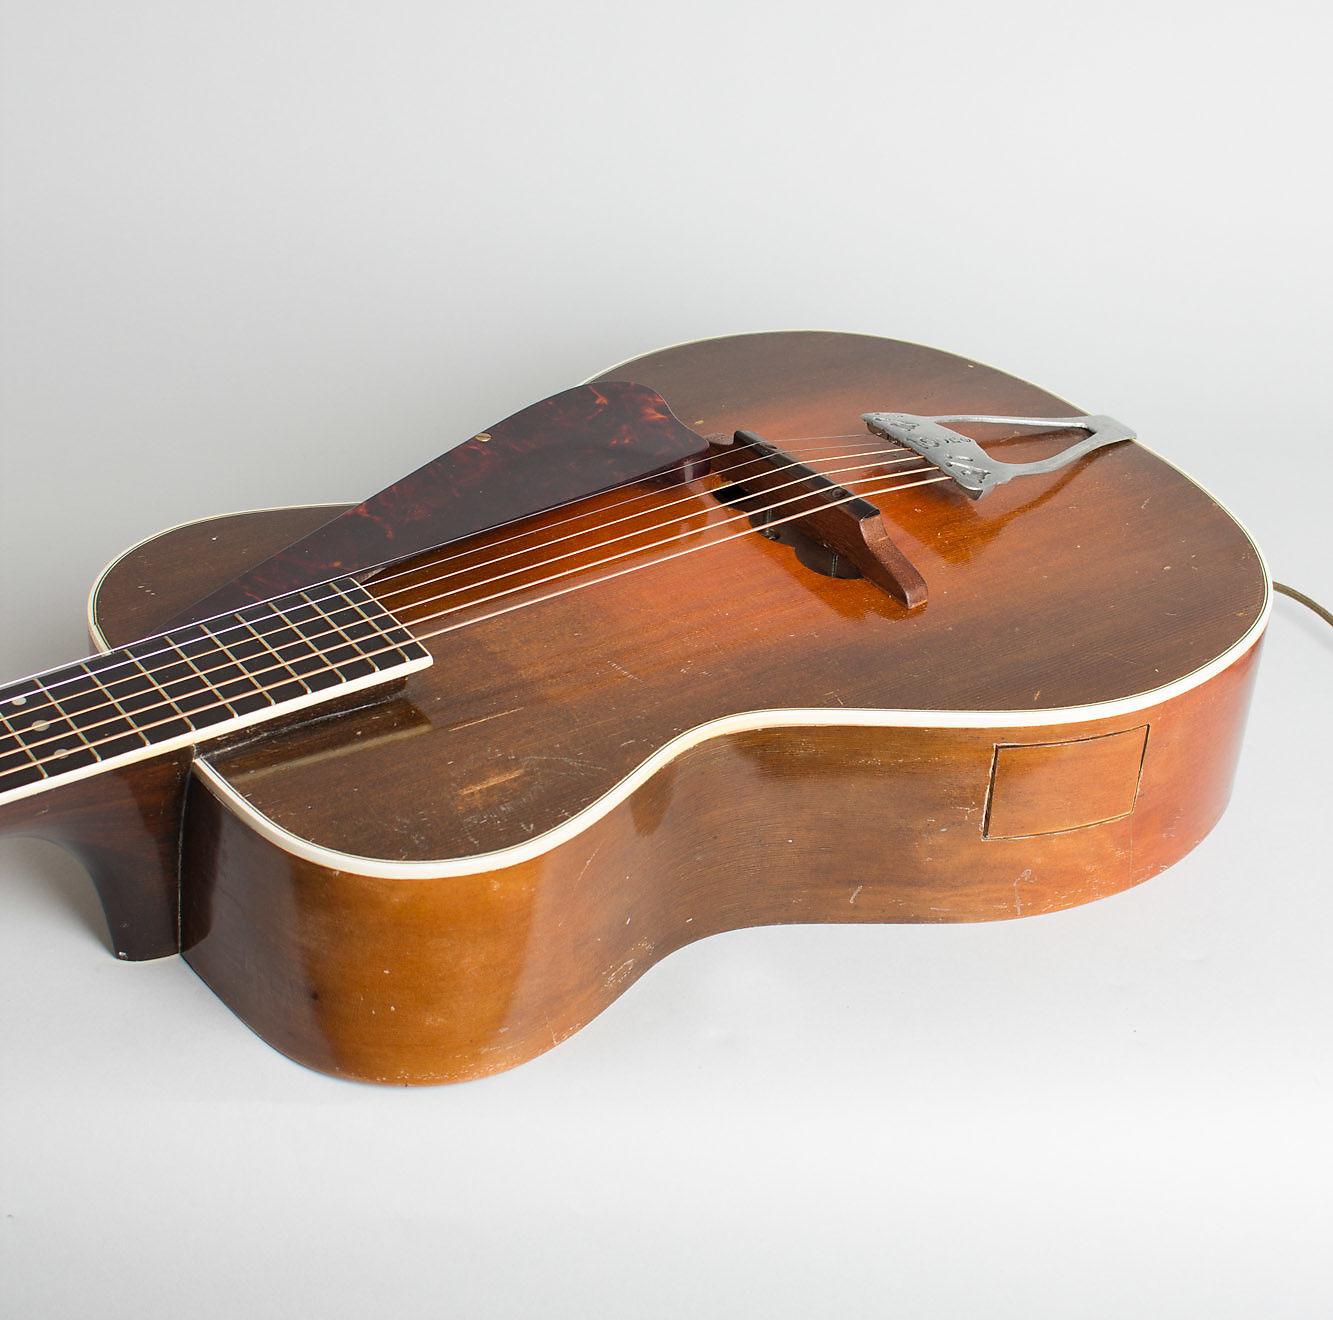 Vivi-Tone  Acoustic-Electric Guitar (1933), ser. #263.